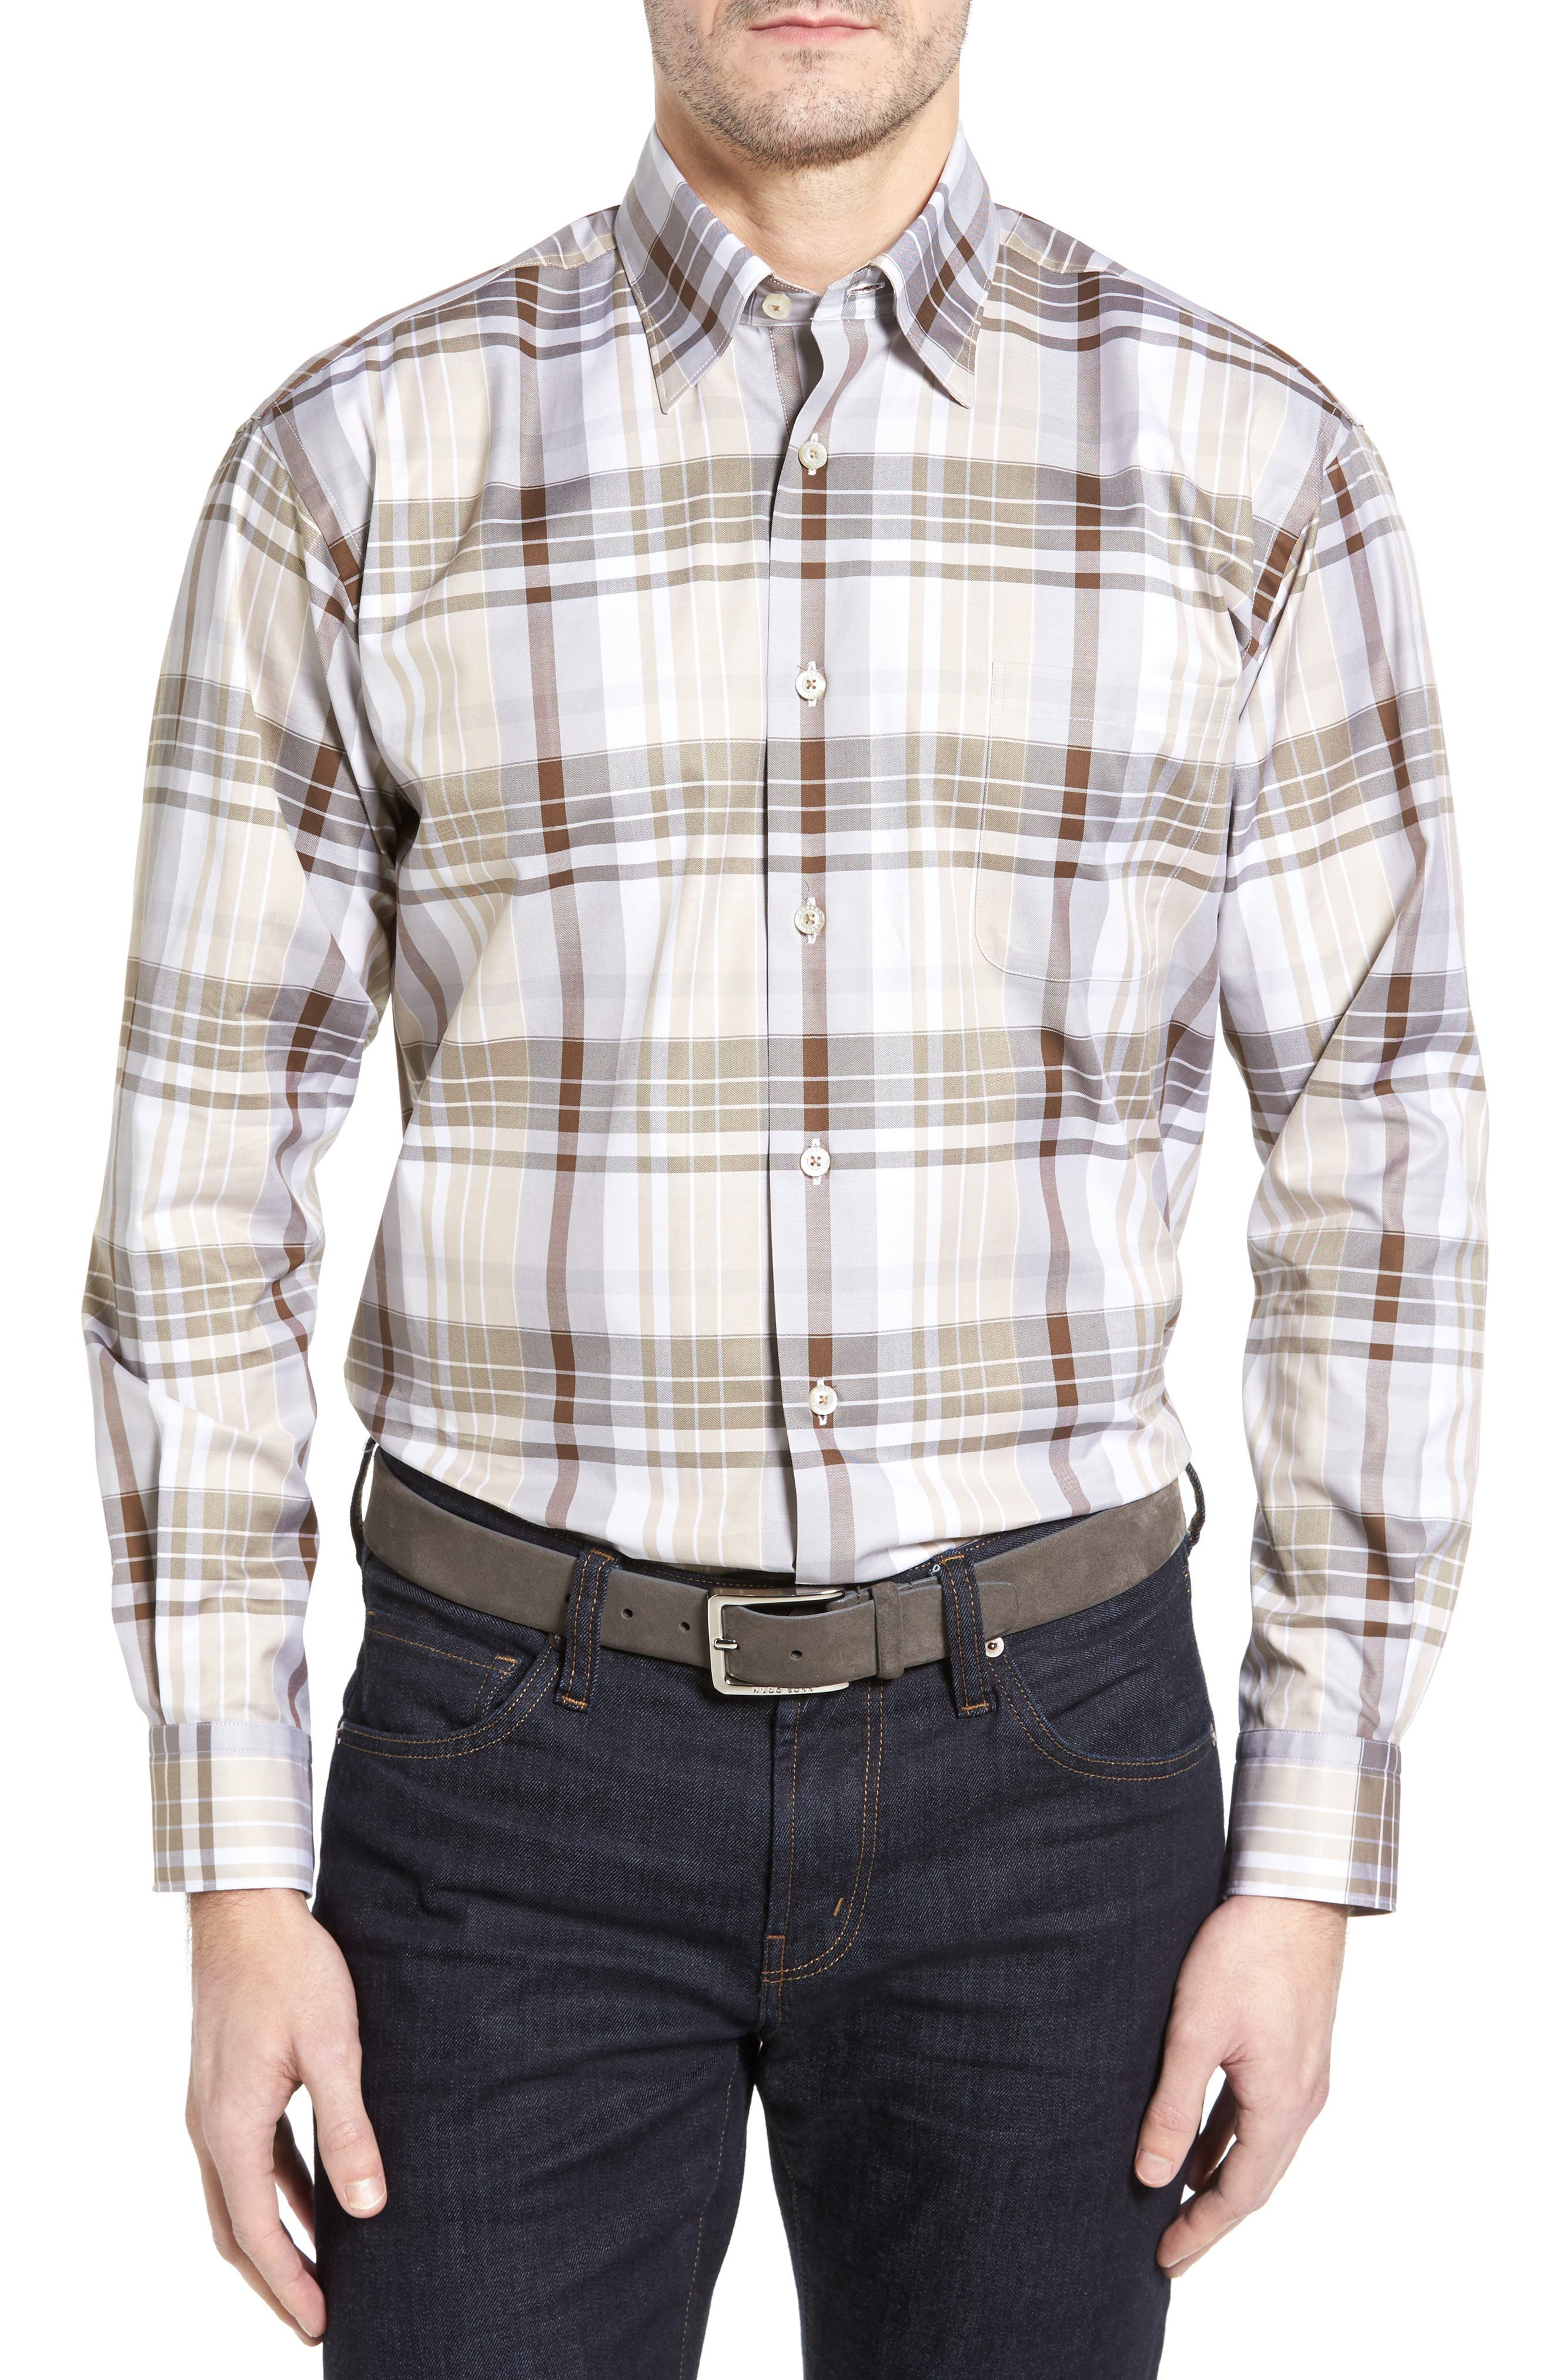 Alternate Image 1 Selected - Robert Talbott Anderson Classic Fit Plaid Micro Twill Sport Shirt